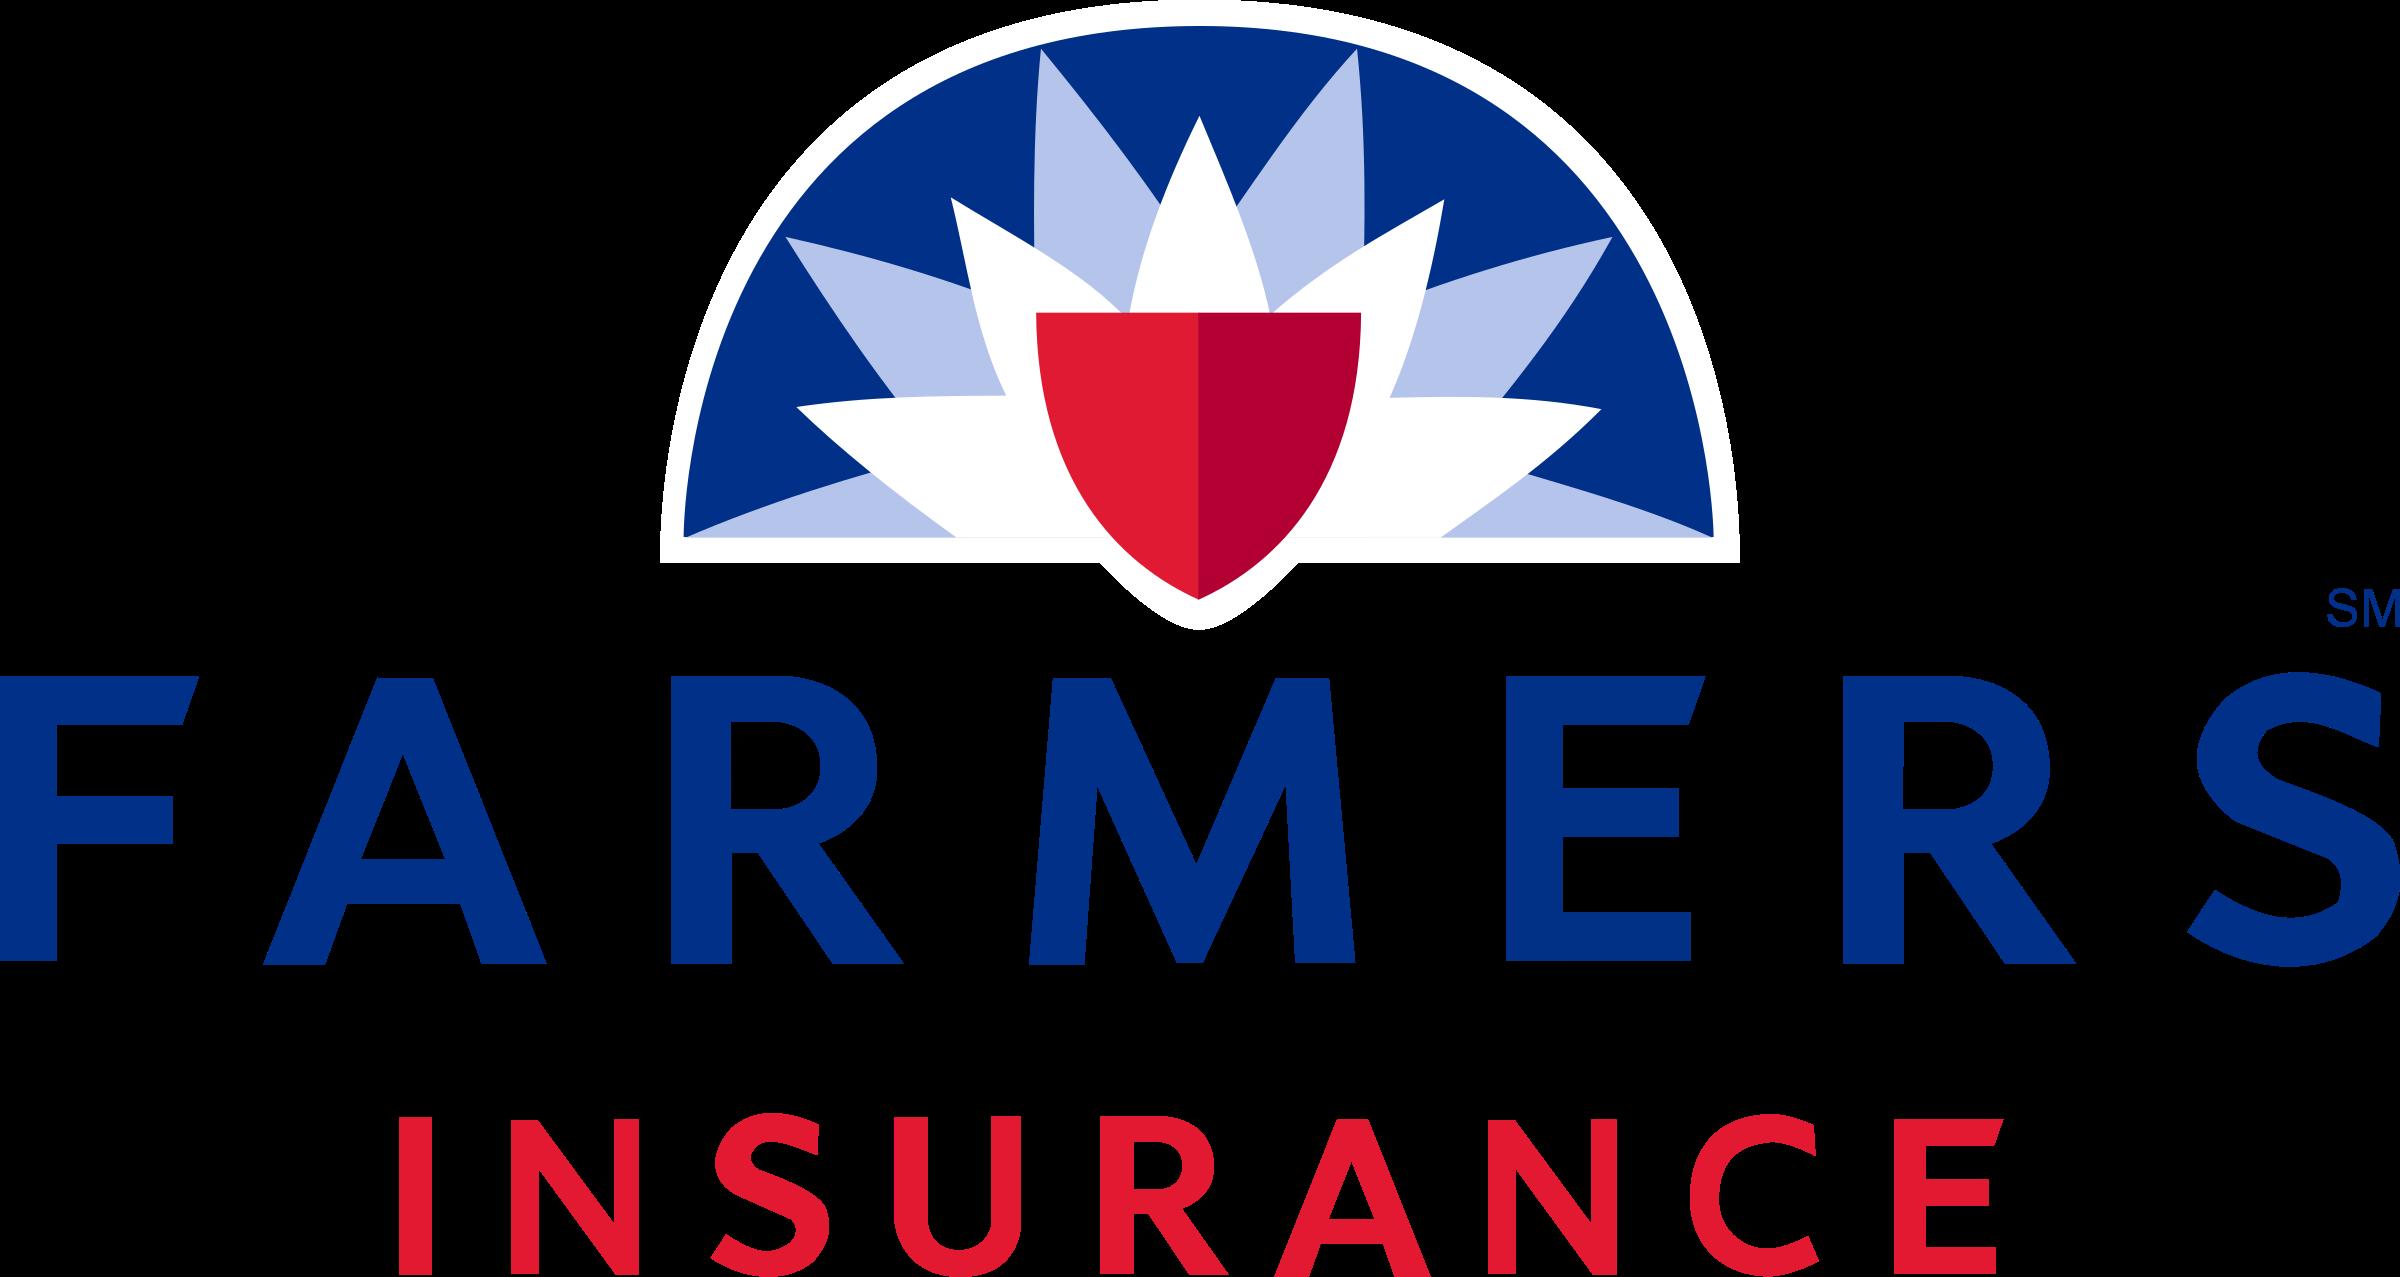 Farmers Insurance Logo PNG Transparent & SVG Vector - Freebie Supply